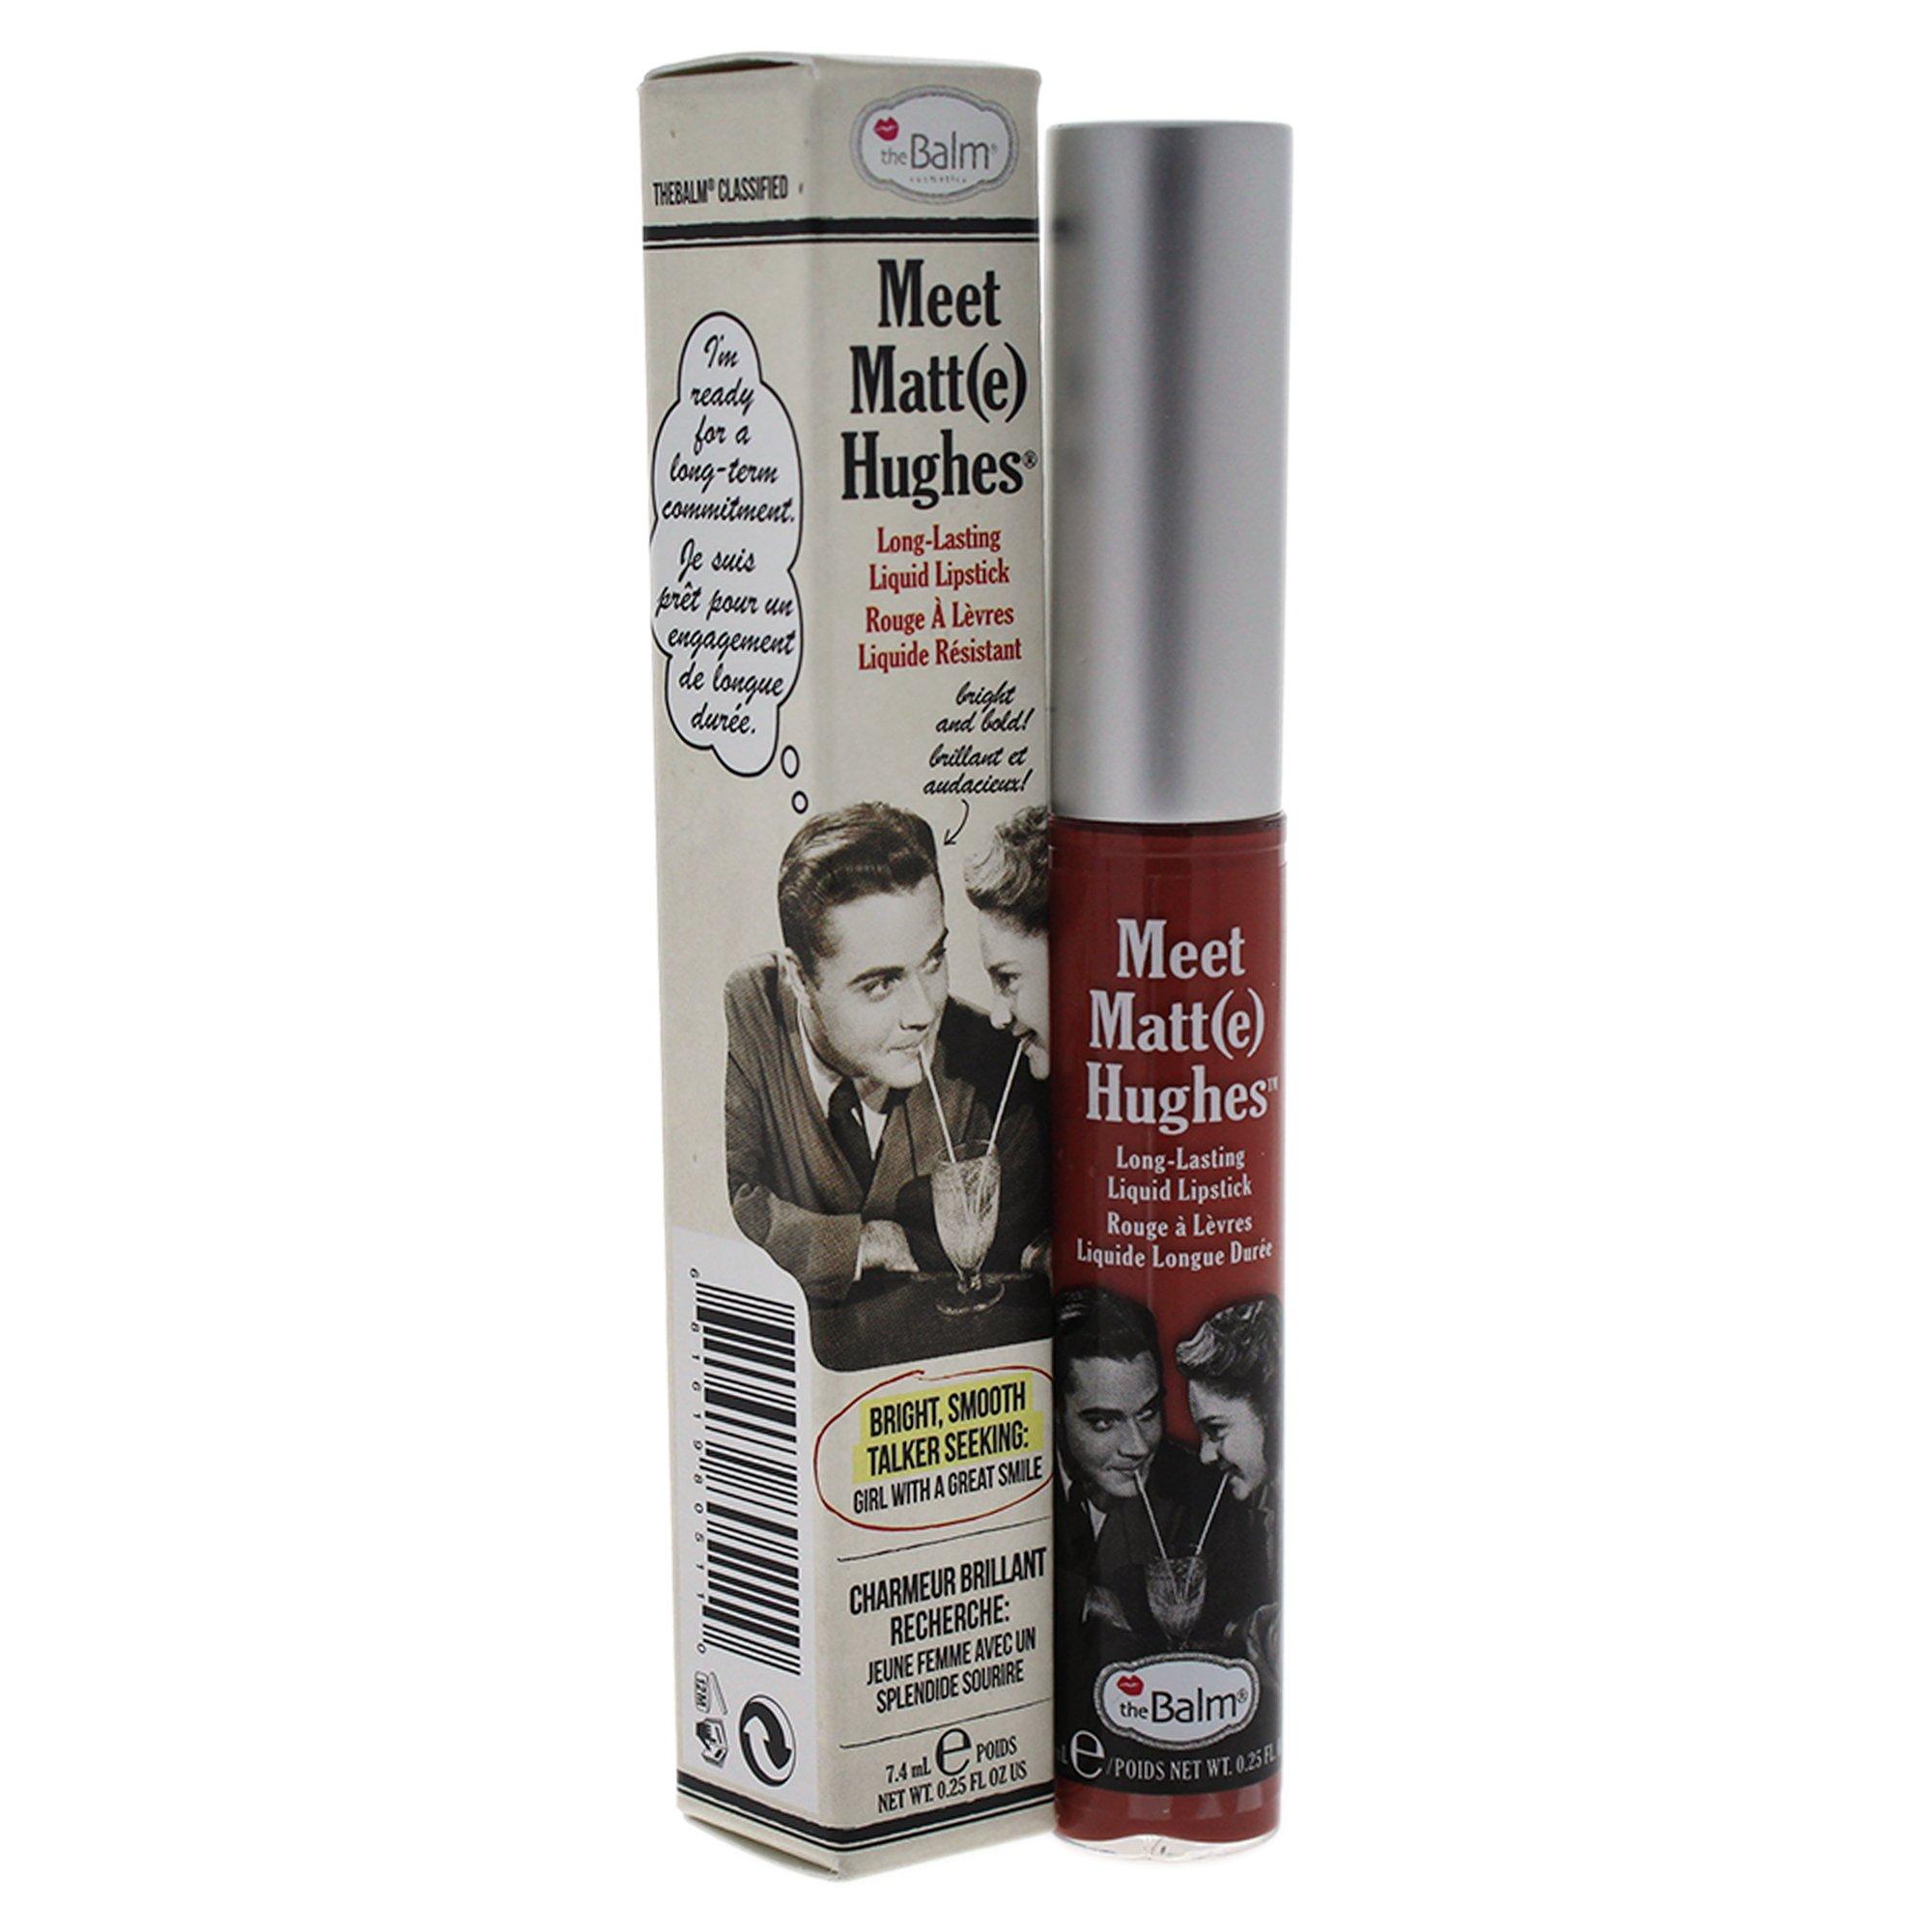 theBalm Meet Matte Hughes Long-Lasting Liquid Lipstick, Committed, Lightweight Matte Finish by theBalm